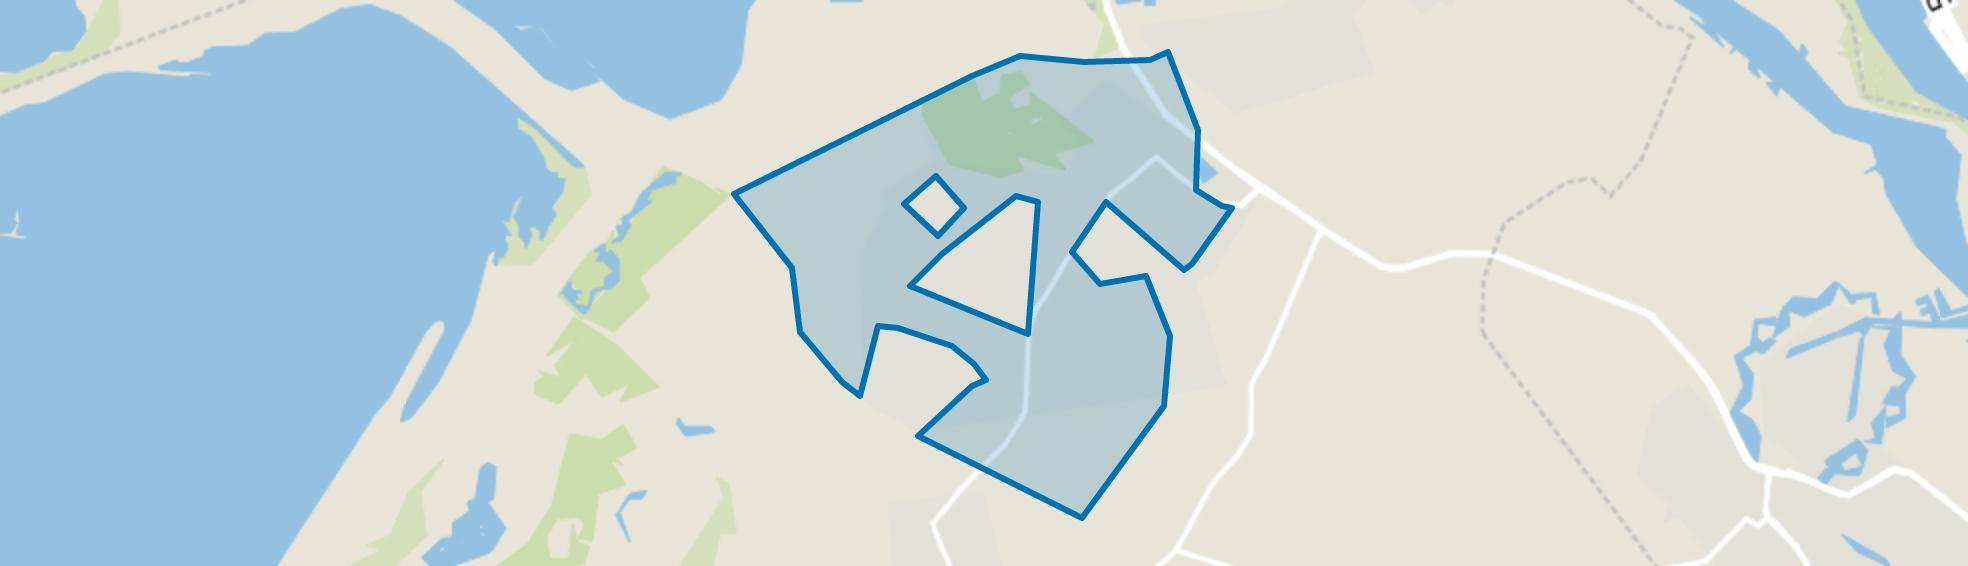 Oostvoorne, Oostvoorne map